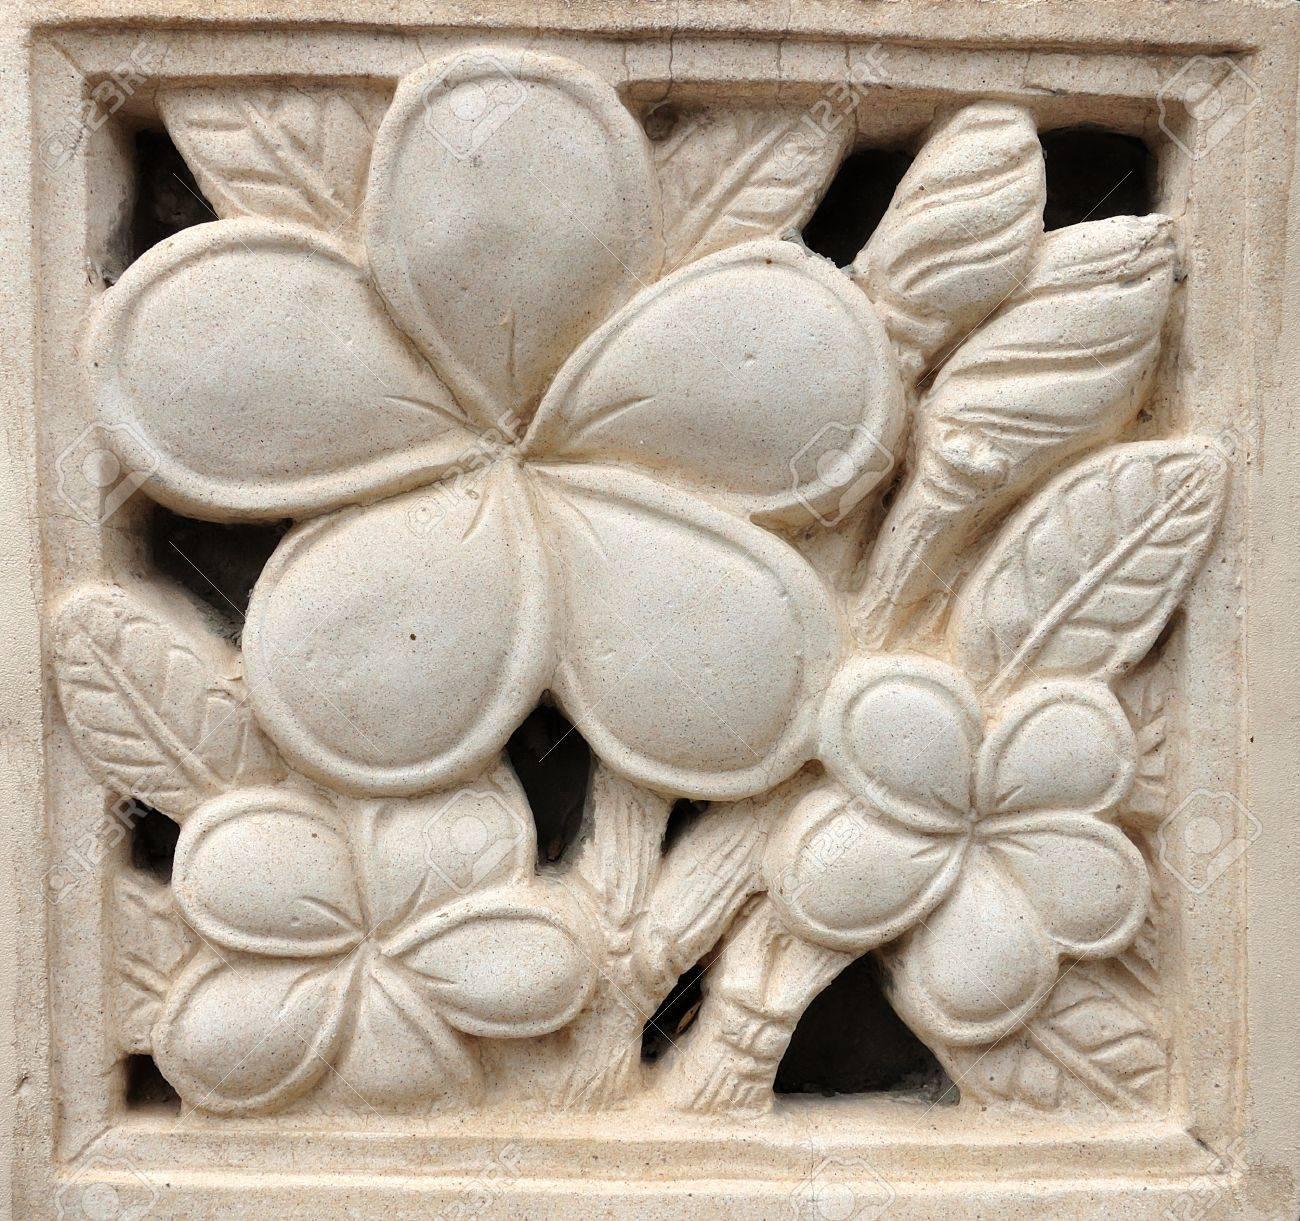 Stone Plumeria Craft Art Design For Spa Frangipani Stock Photo